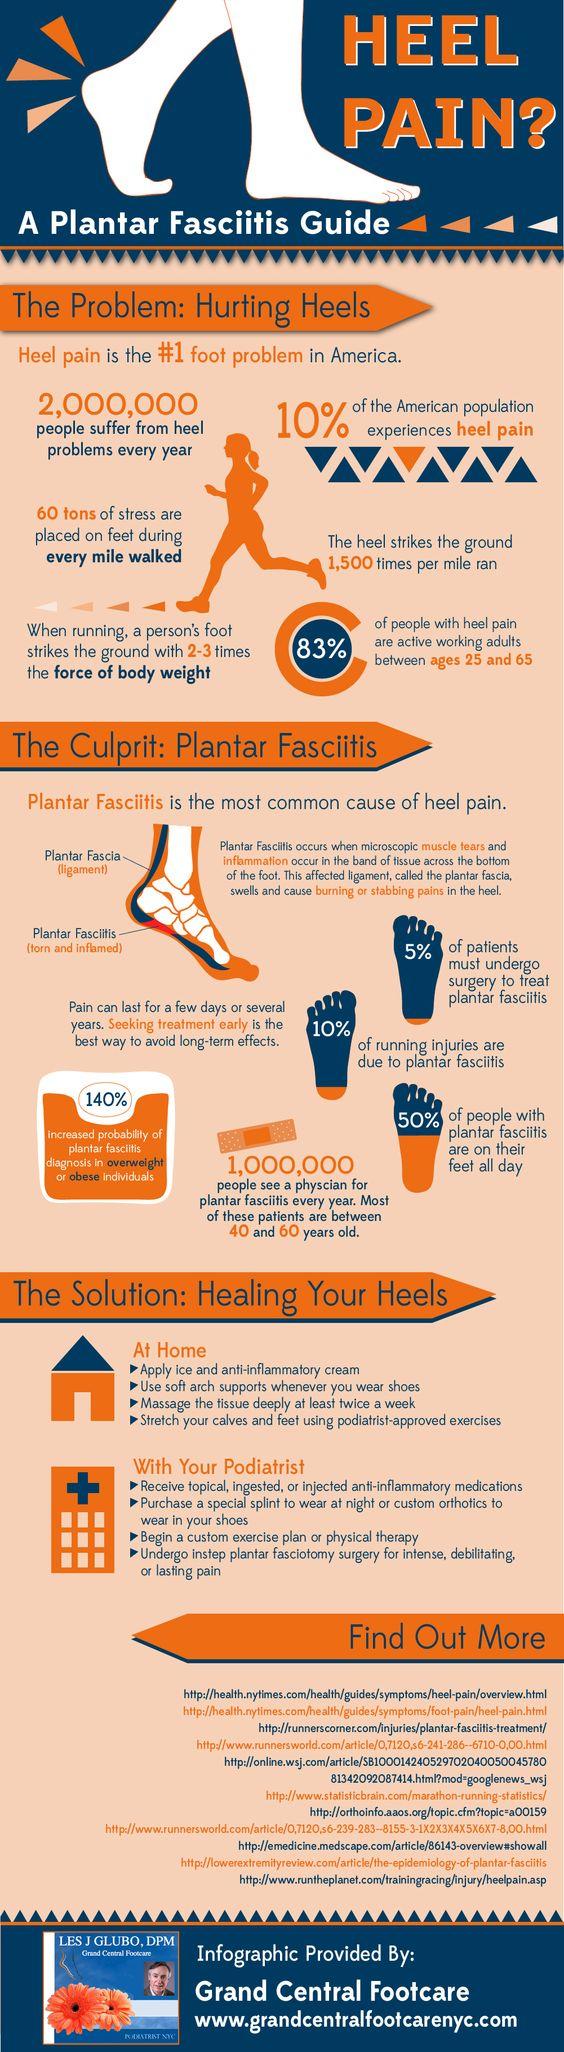 Heel Pain? A Plantar Fasciitis Guide